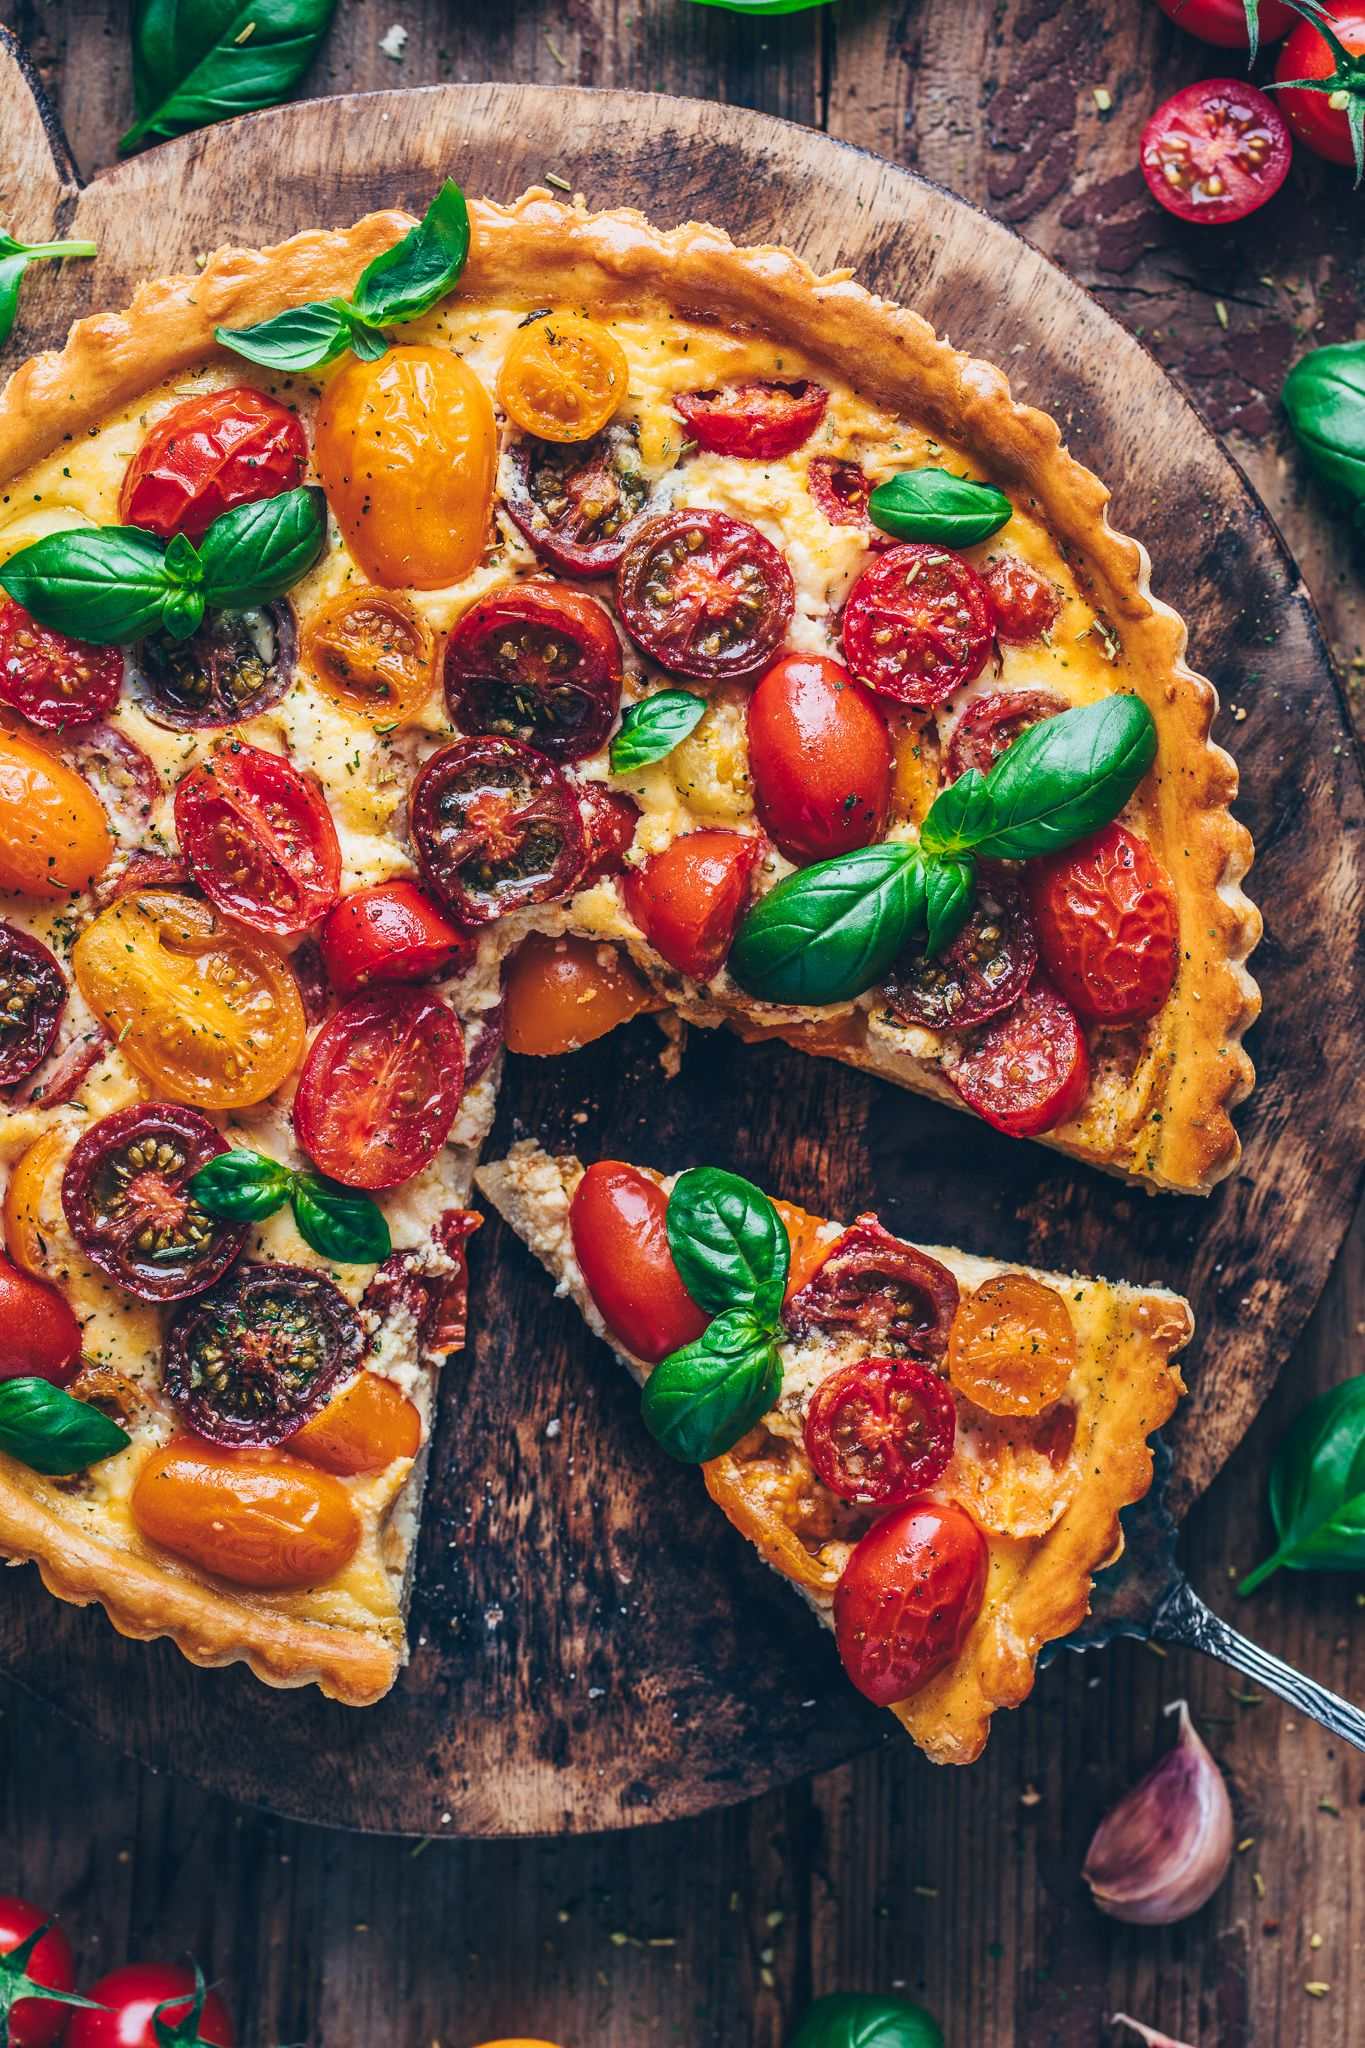 Bunte Tomaten-Tarte | Vegane Quiche - Bianca Zapatka | Rezepte #easypierecipes